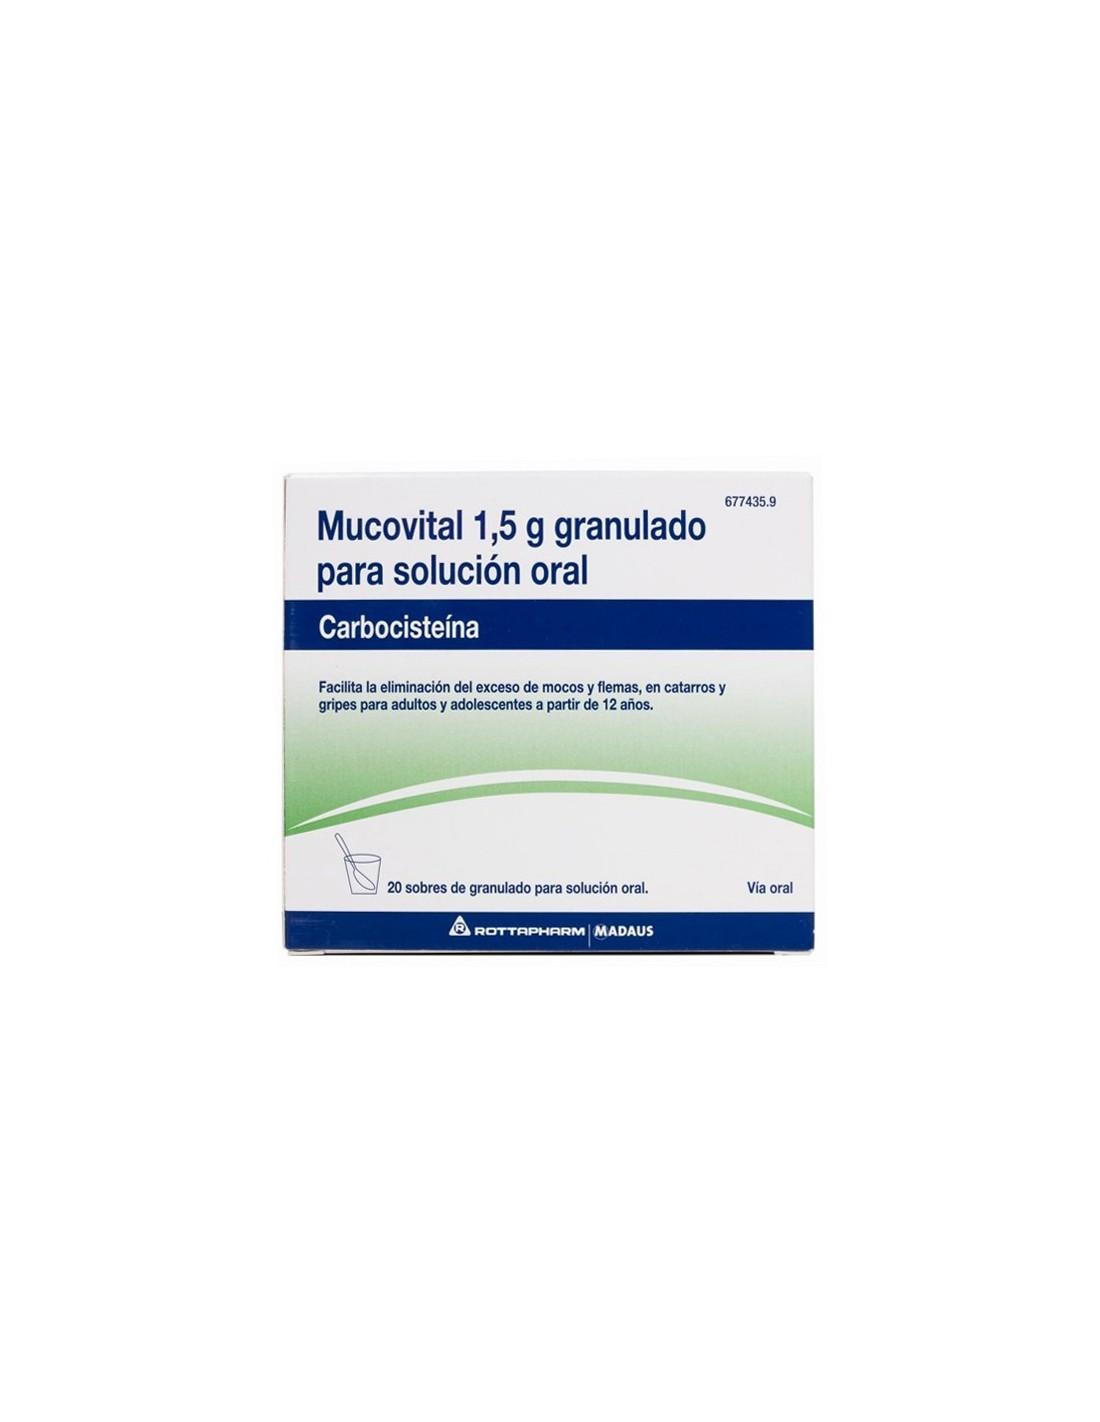 MUCOVITAL 2.7 G 20 SOBRES GRANULADO